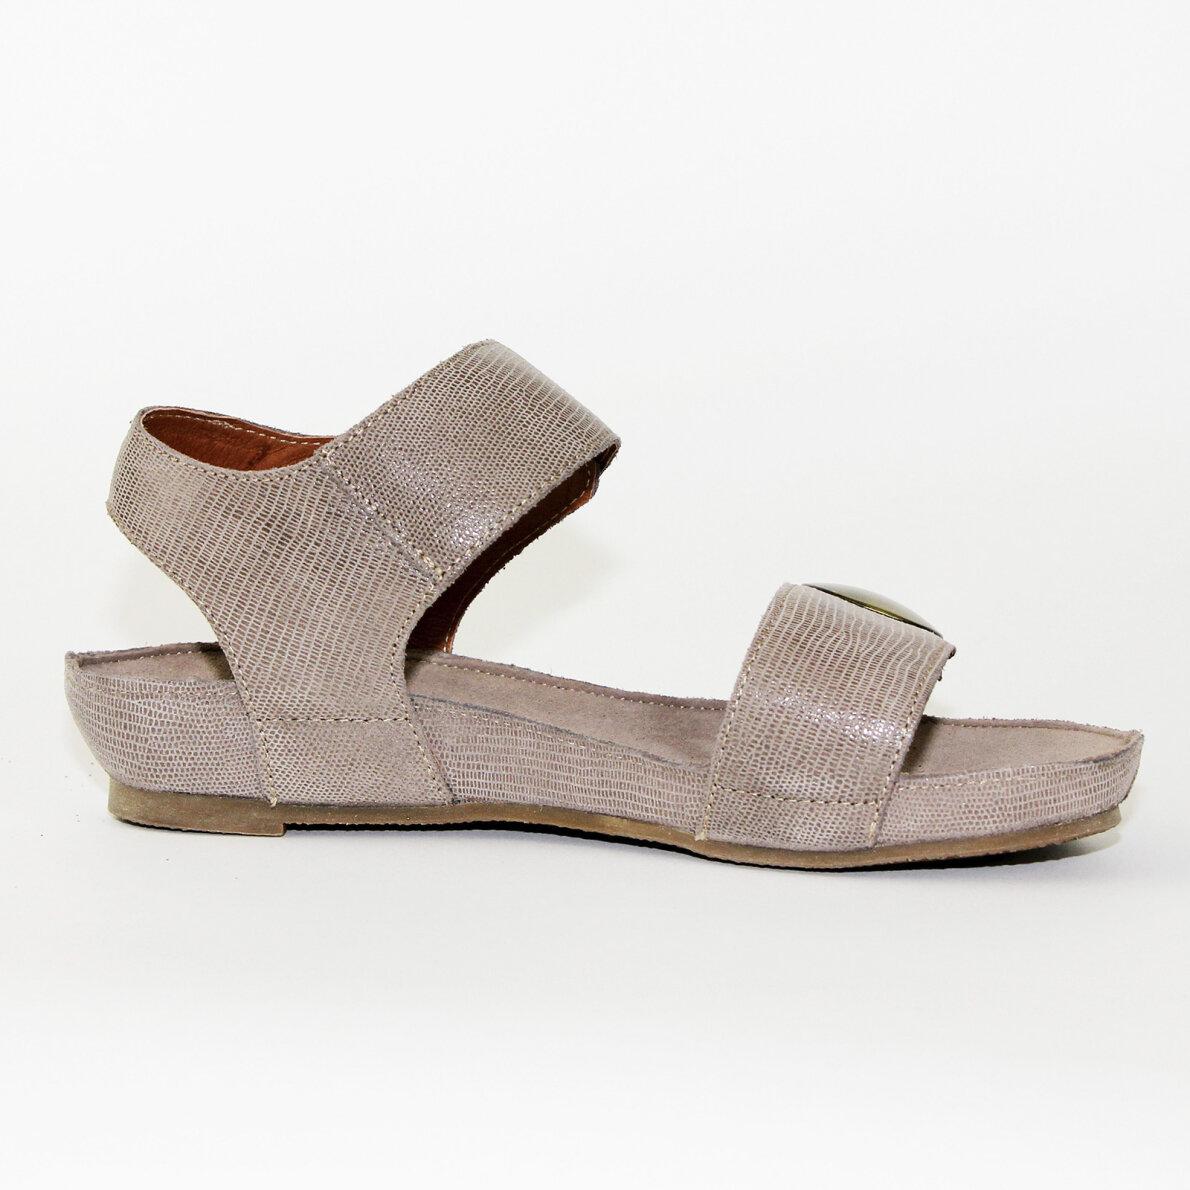 lange støvler tilbud